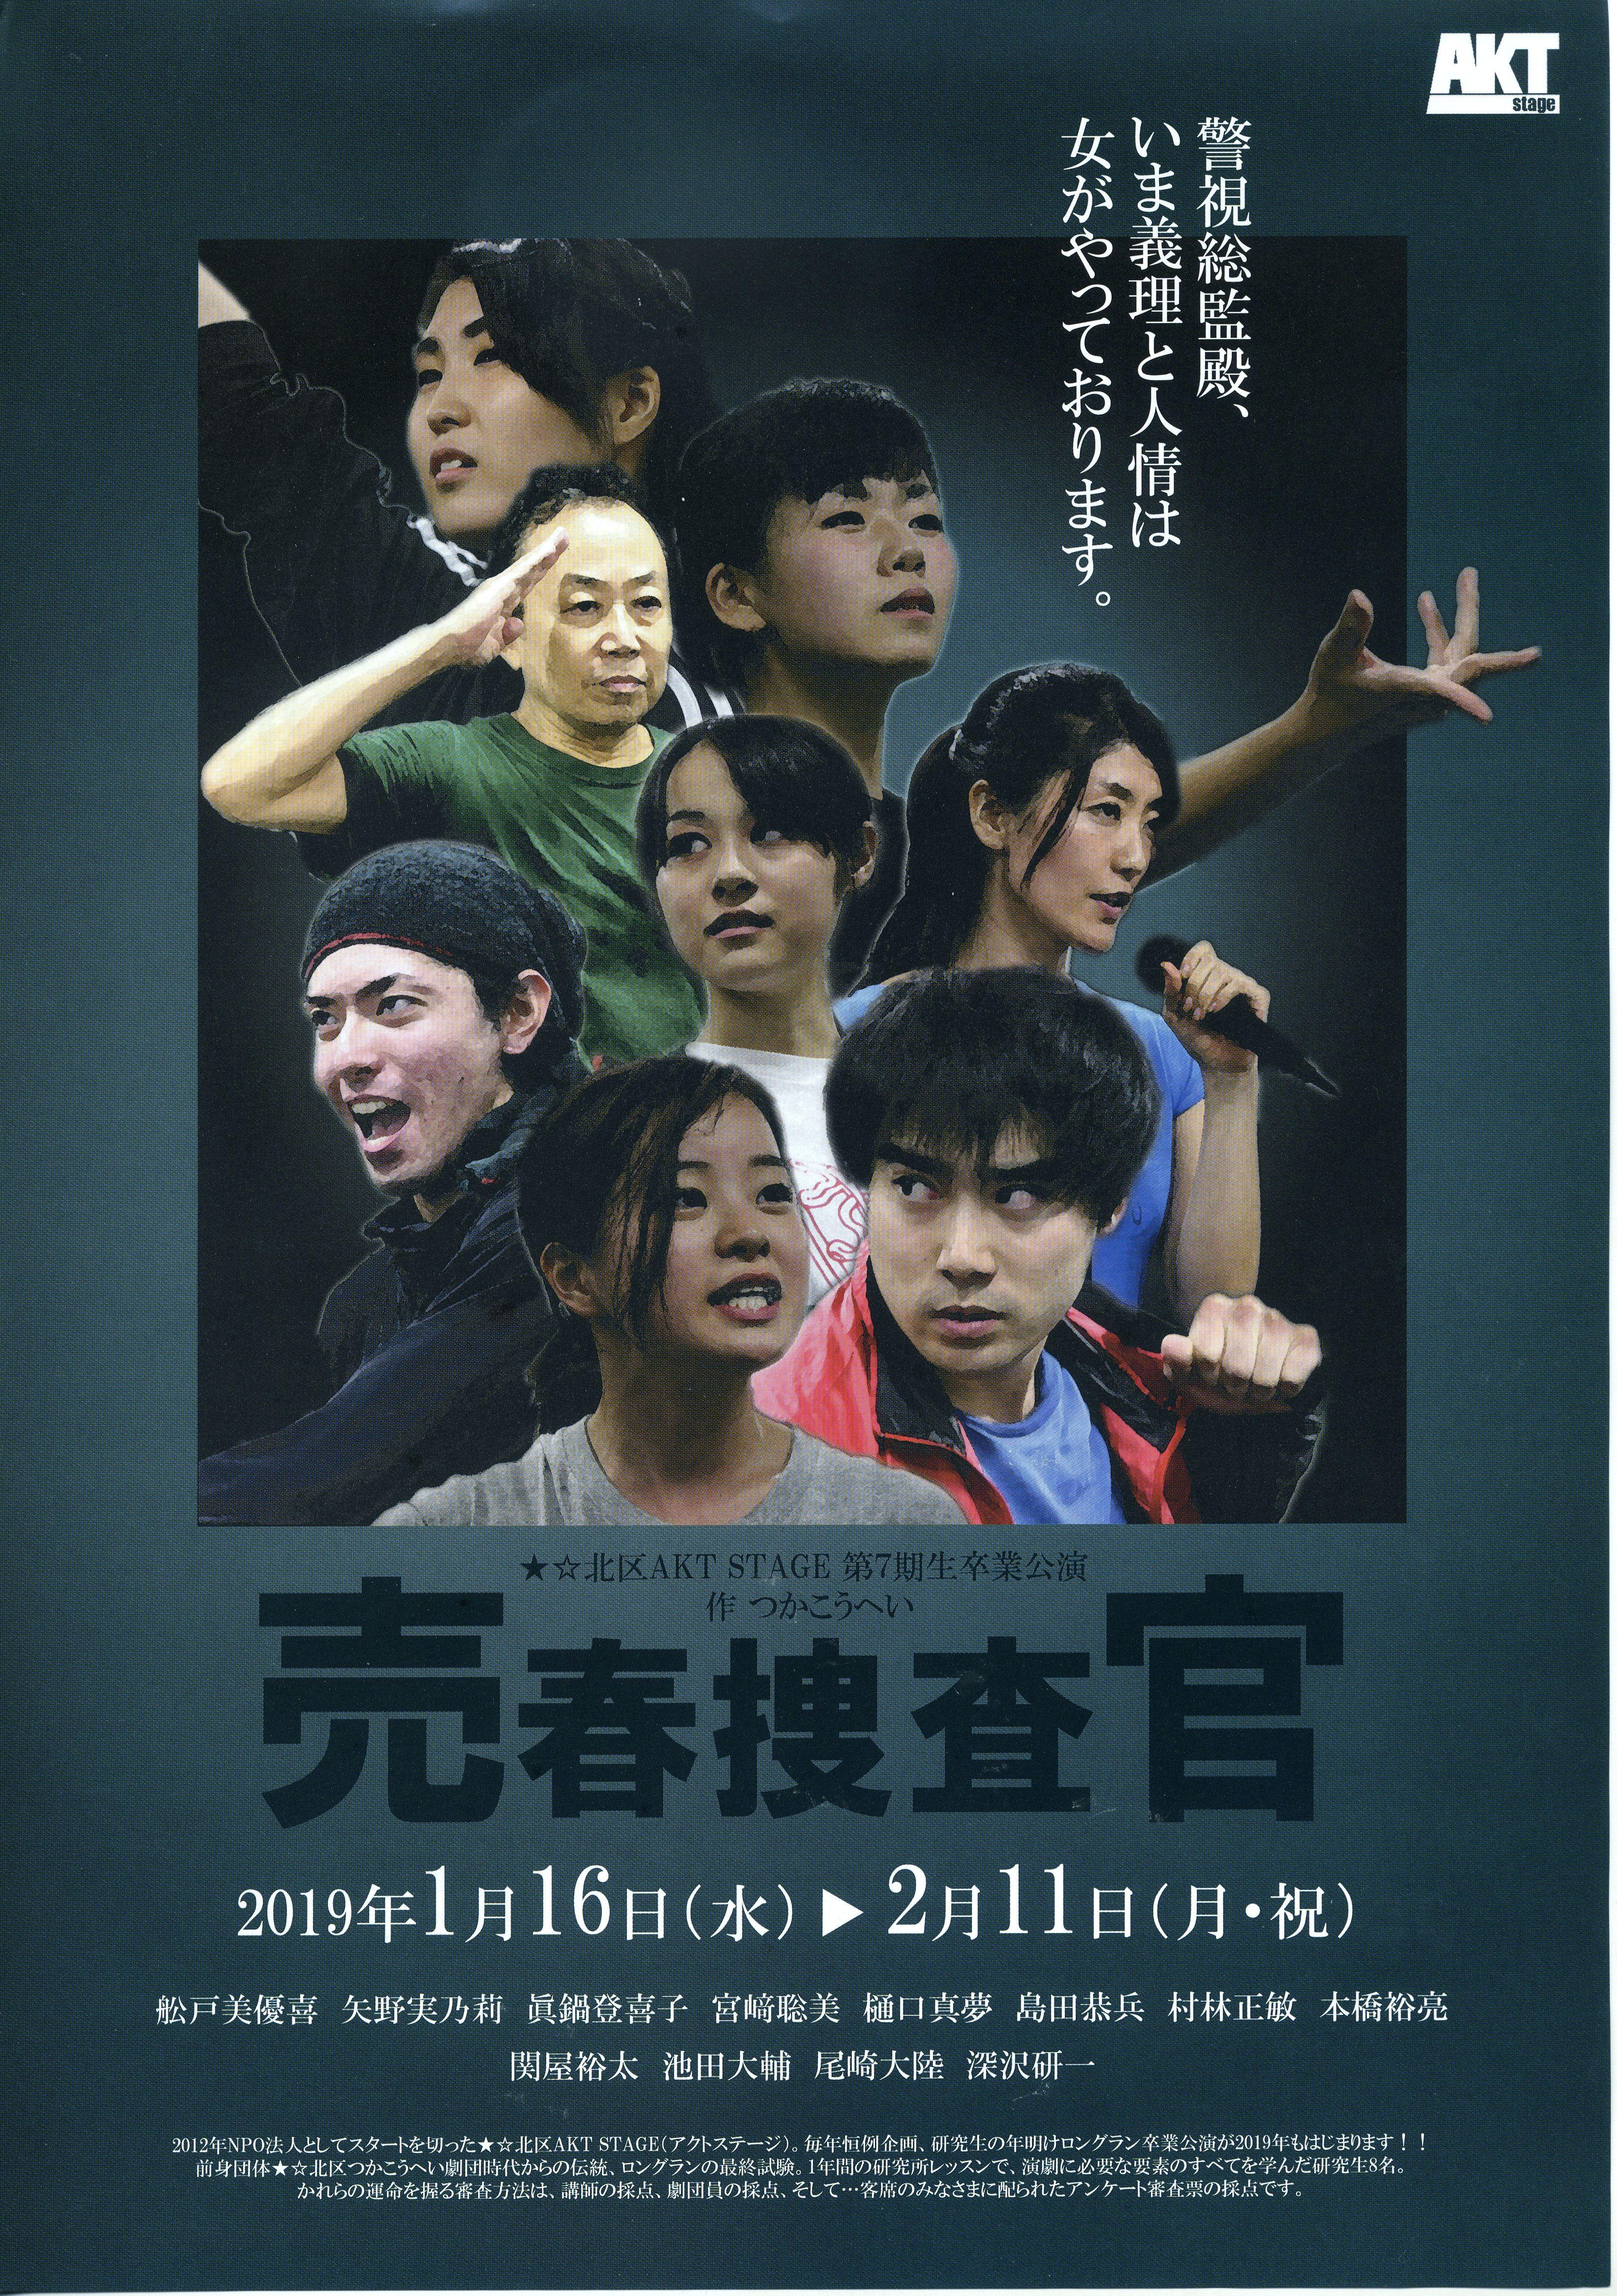 ★☆北区AKT STAGE 第7期生卒業公演『売春捜査官』の画像